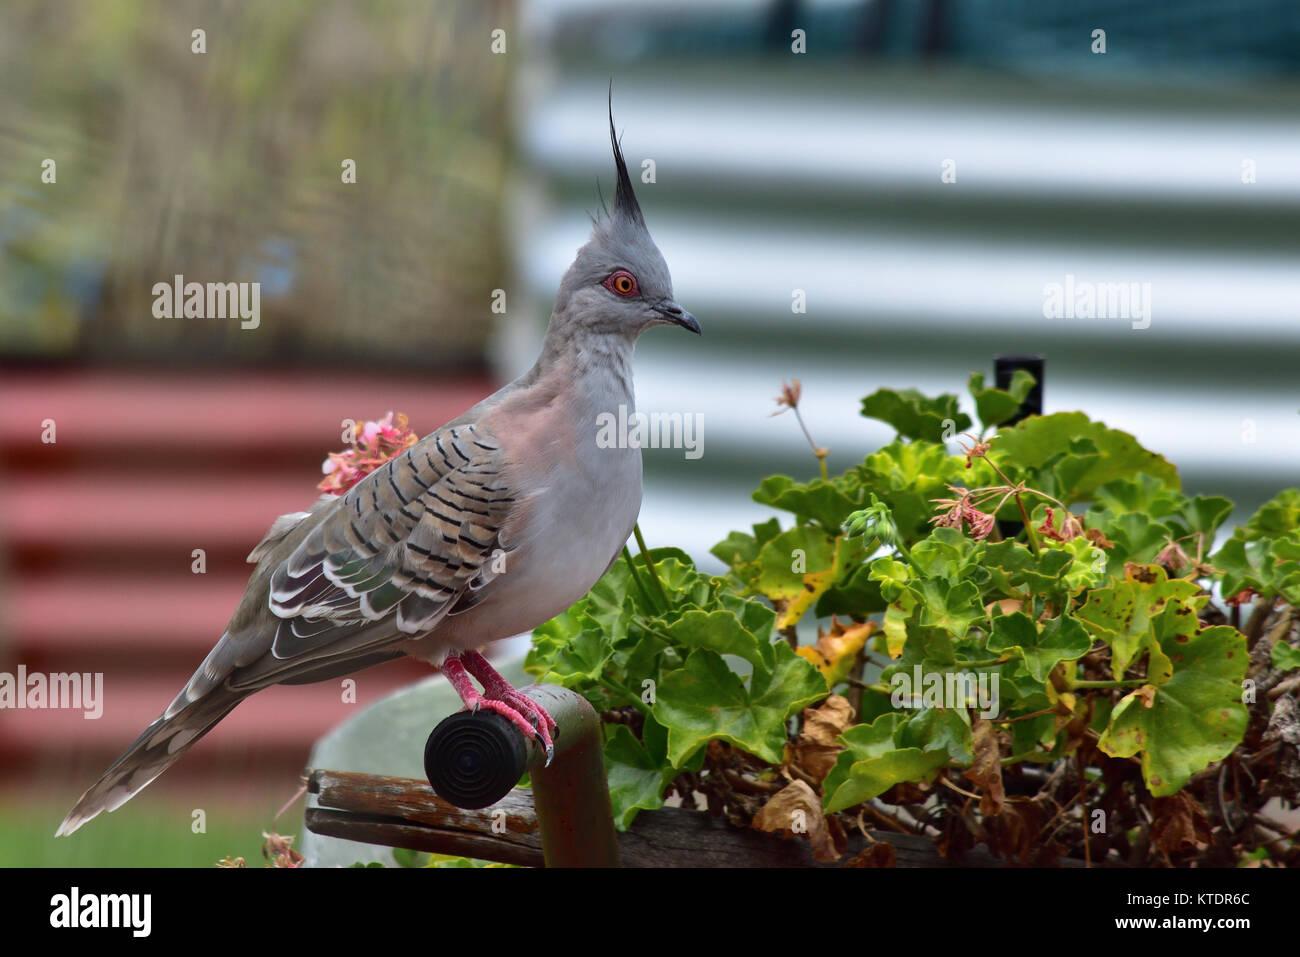 An Australian Crested Pigeon resting on a Garden Wheelbarrow - Stock Image